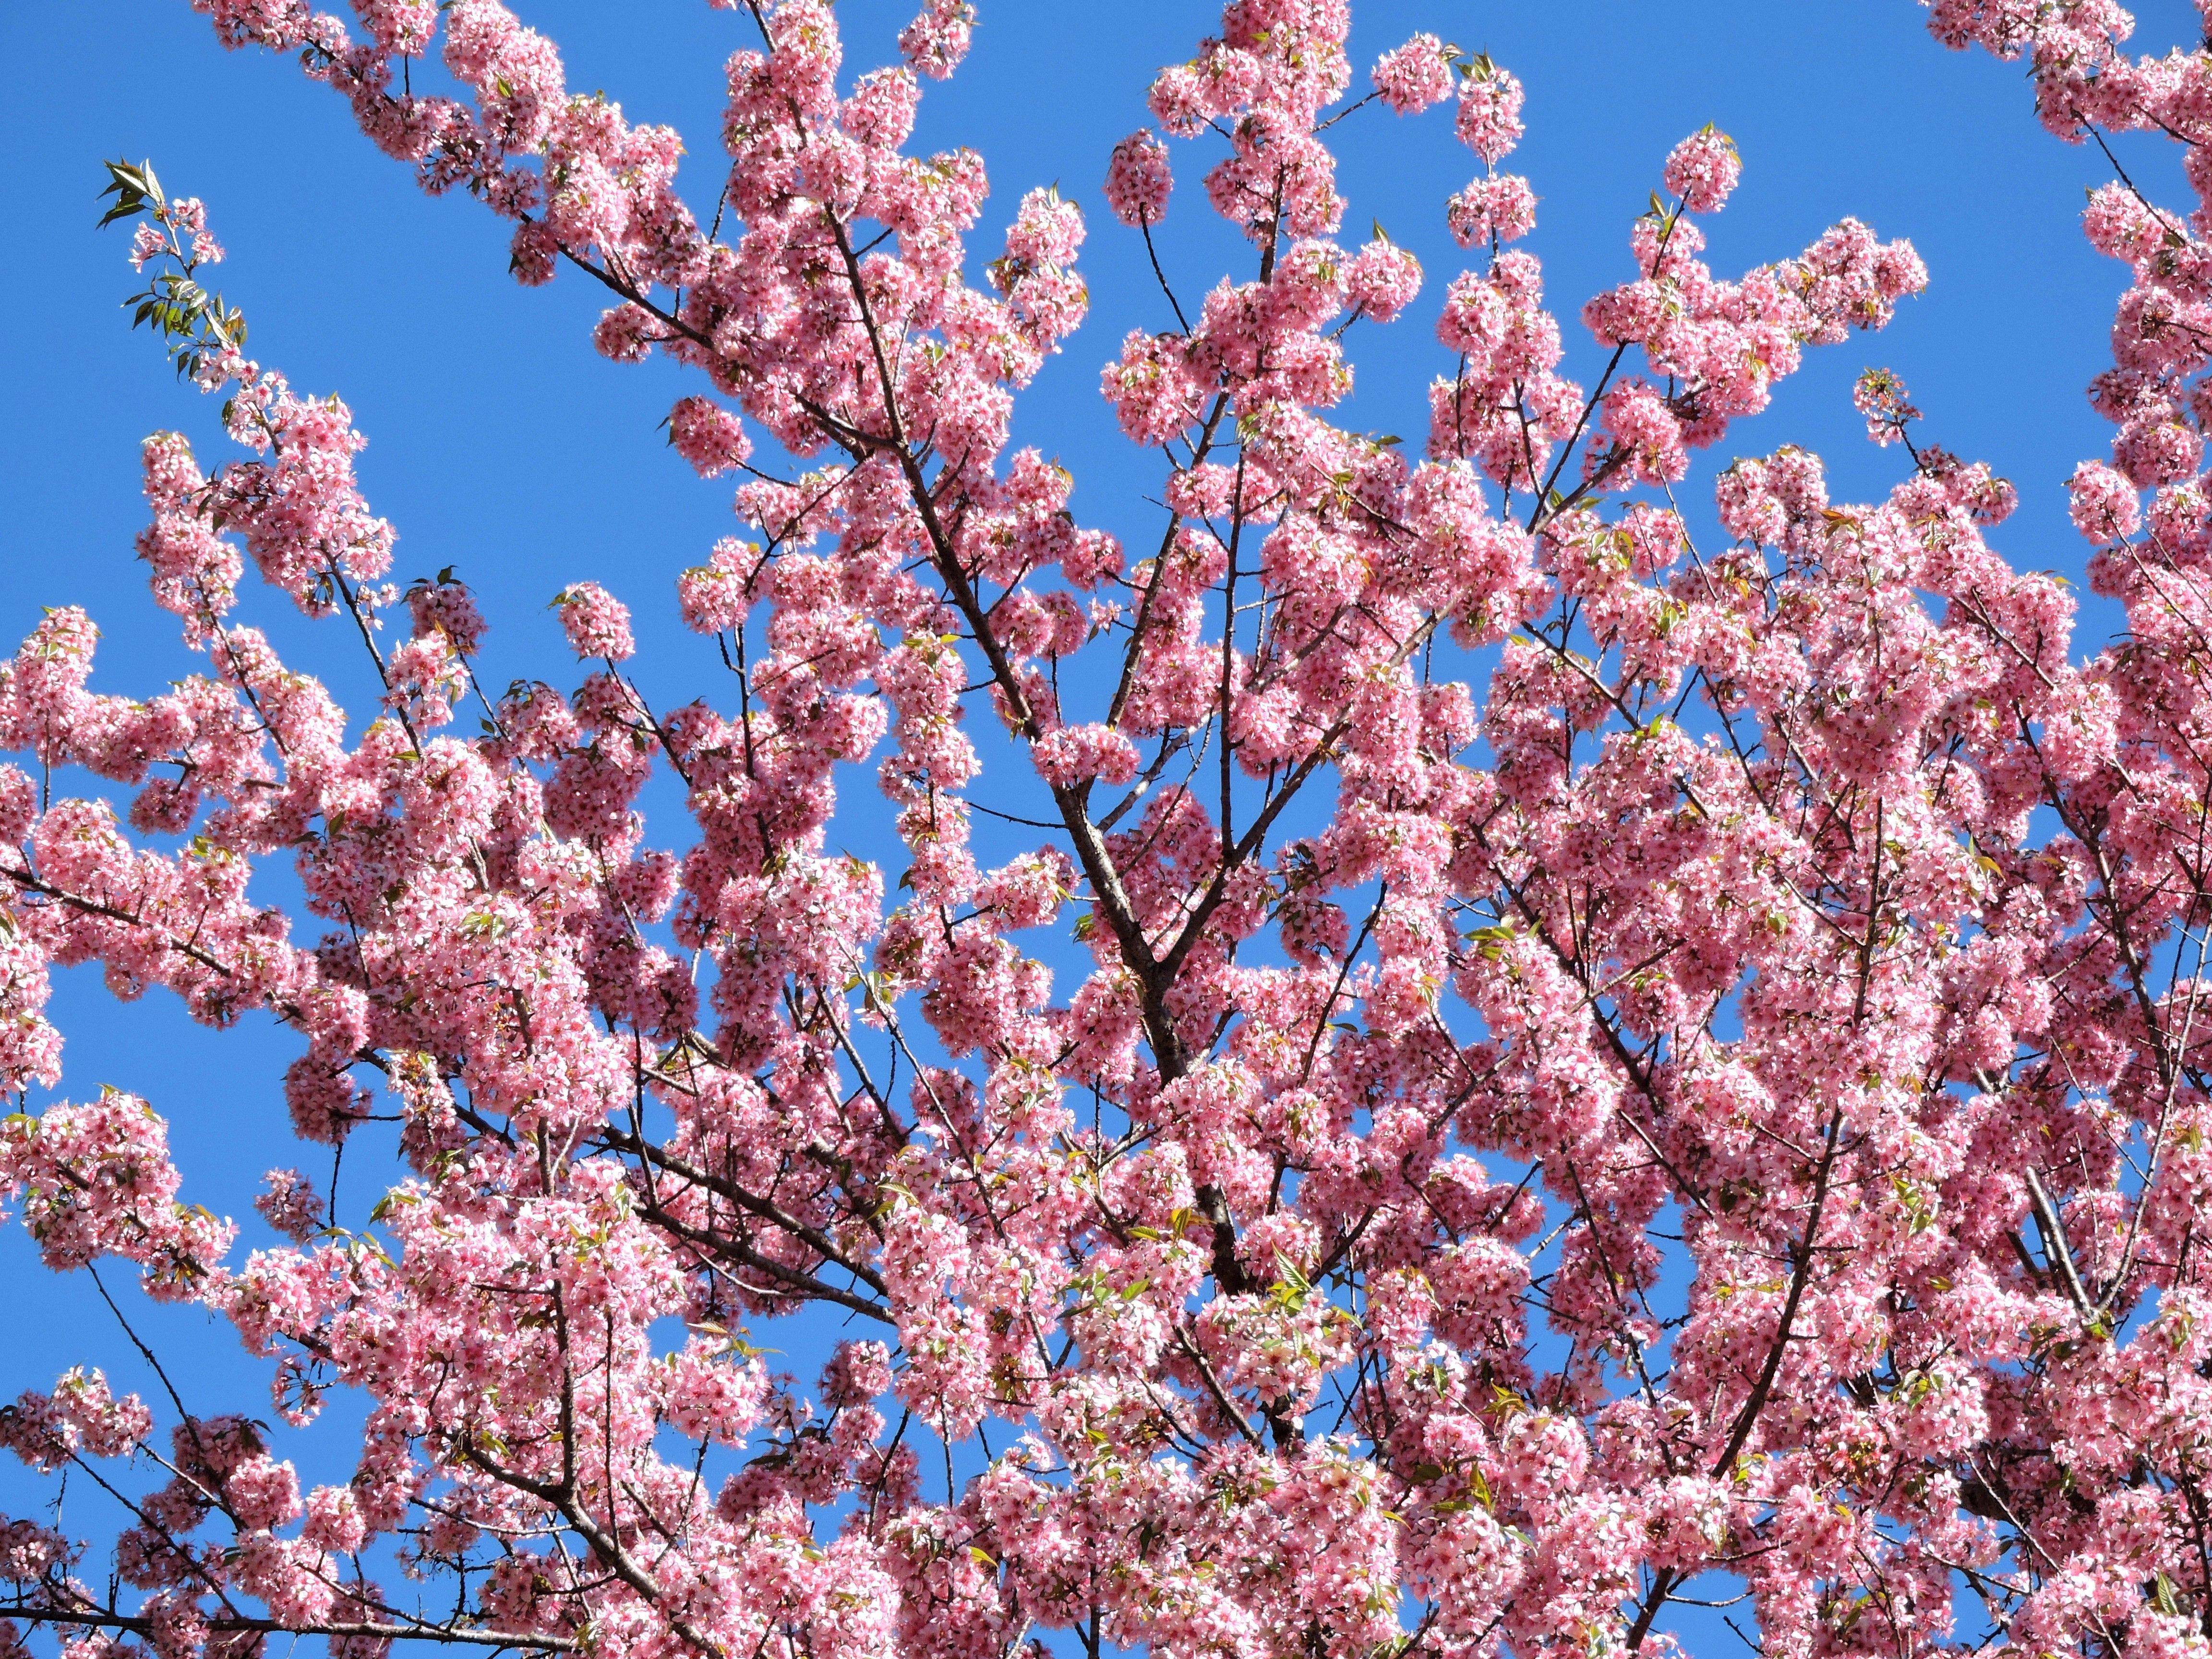 Cherry Blossom Festival Meghalaya Northeast India Www Neroutes Com Cherry Blossom Festival Meghalaya Shillong